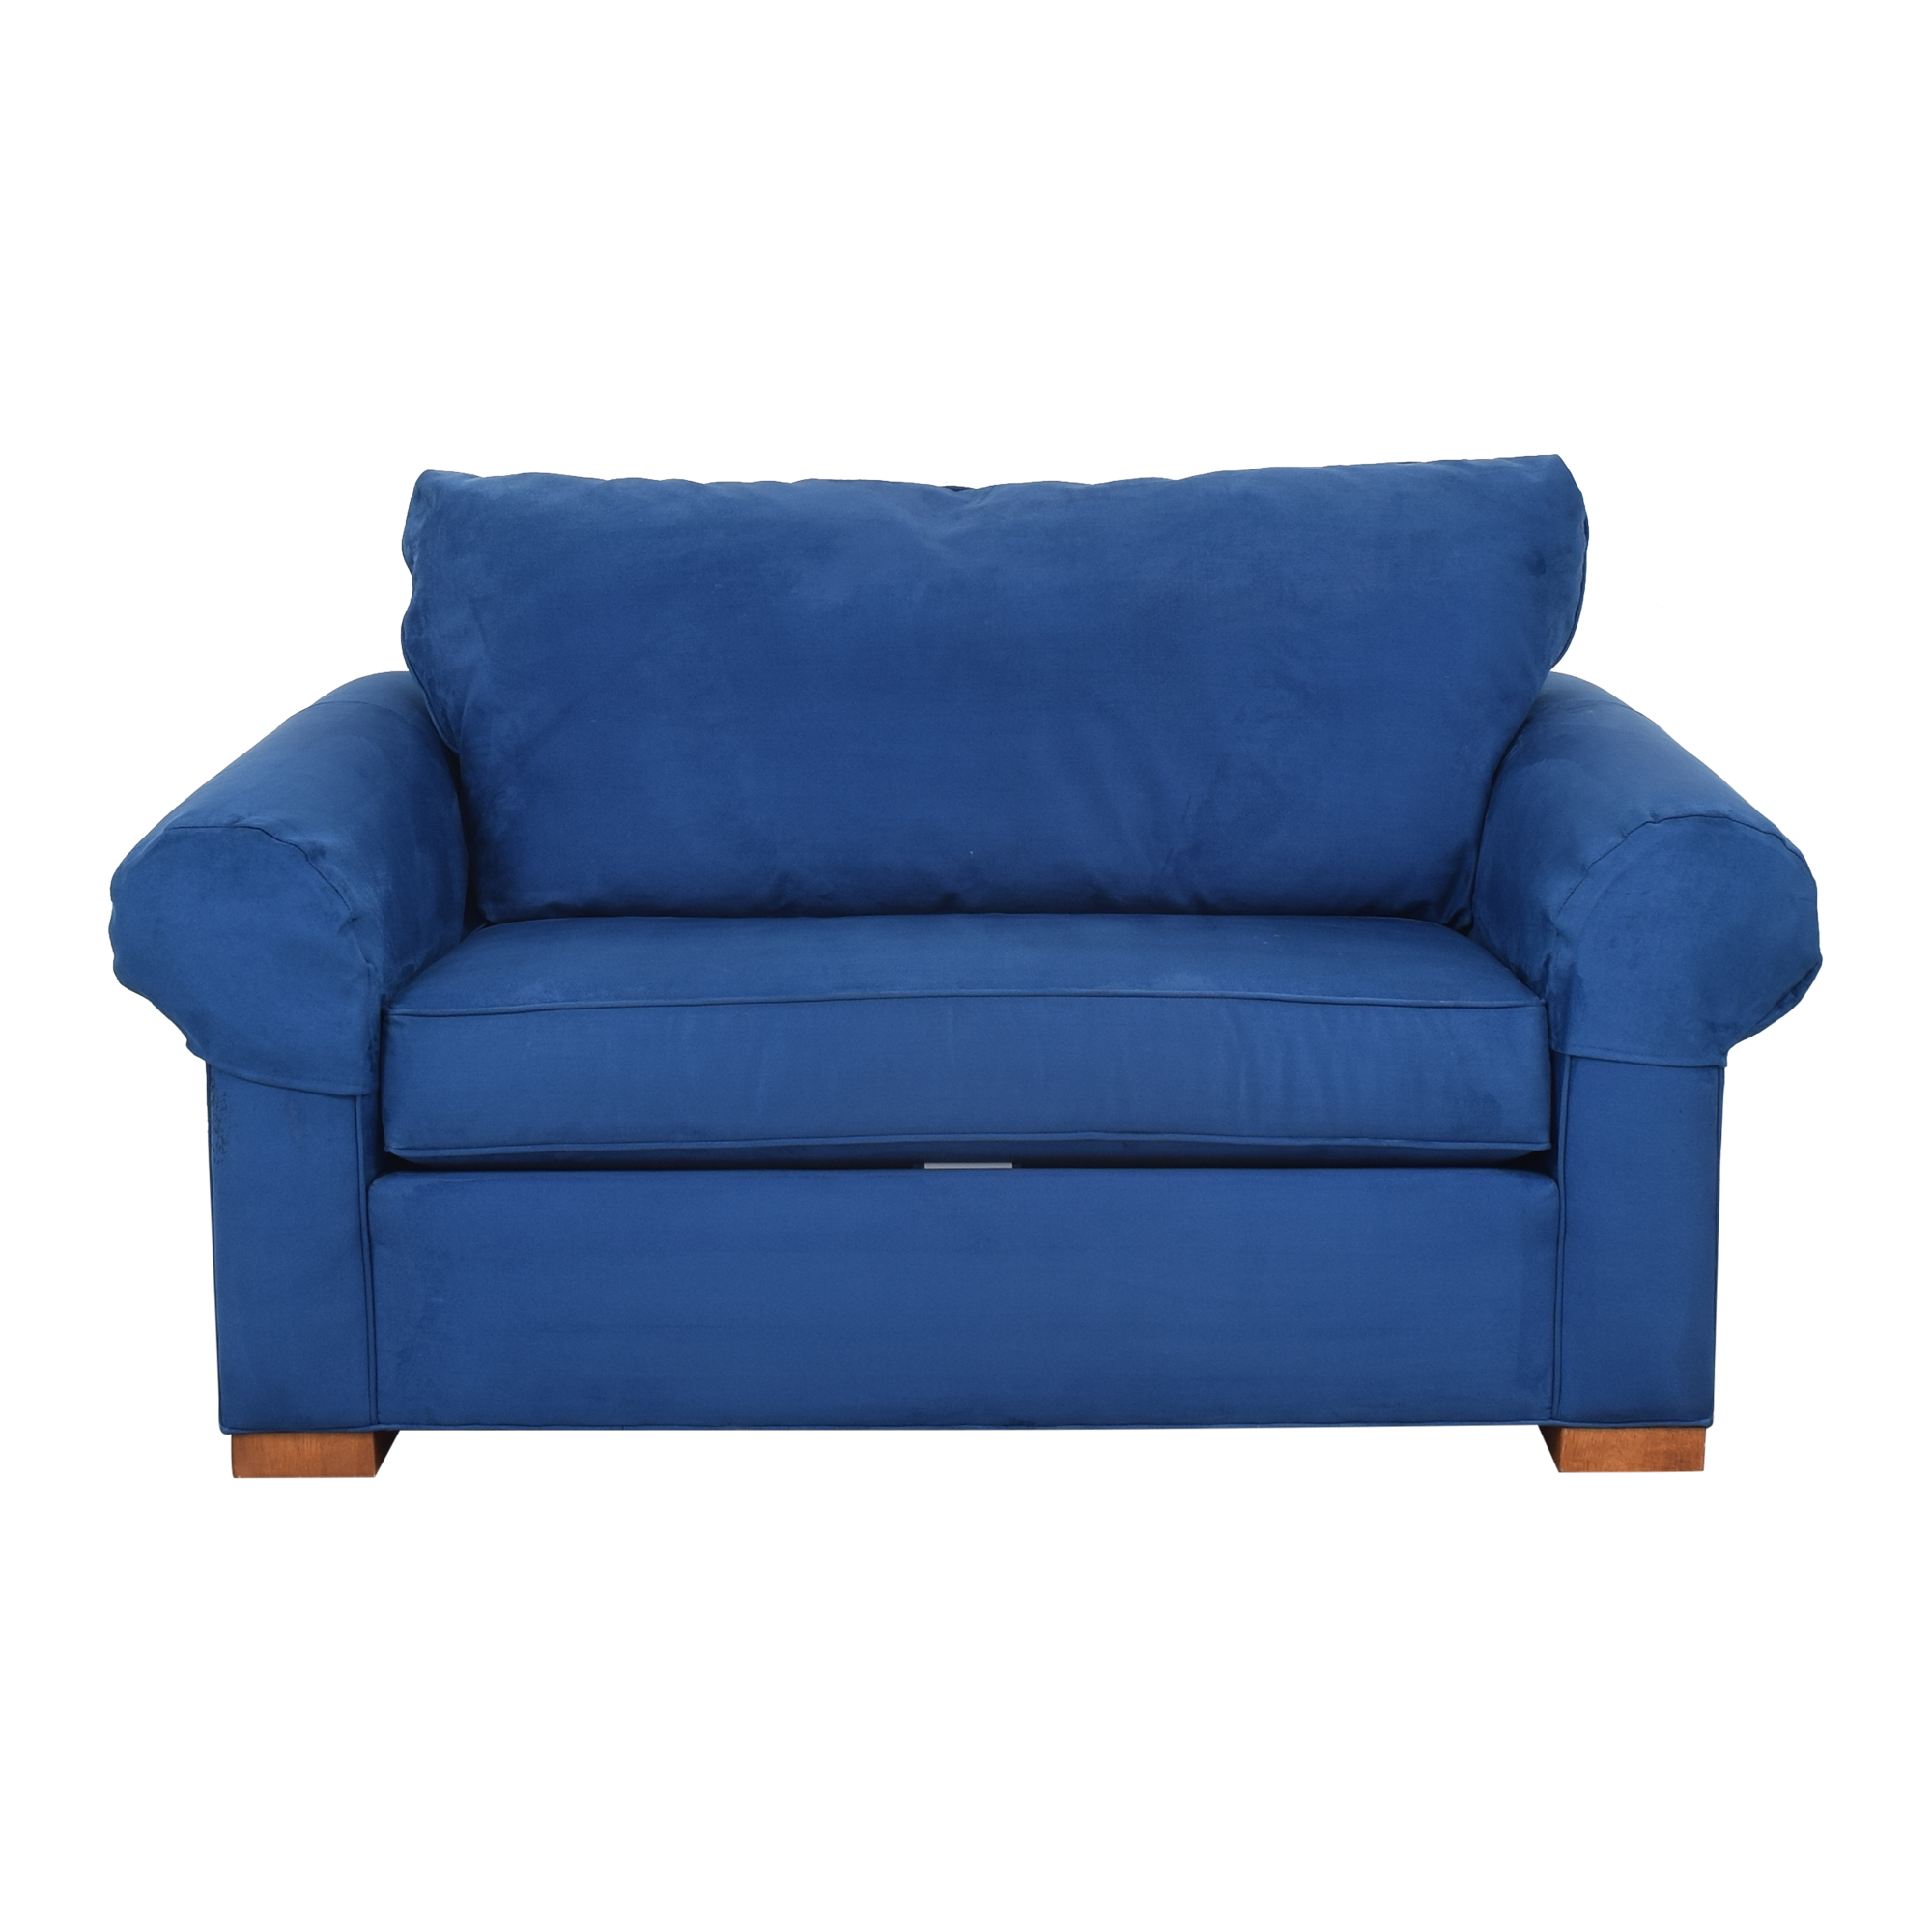 shop Ethan Allen Twin Sleeper Marina Chair with Ottoman Ethan Allen Chairs